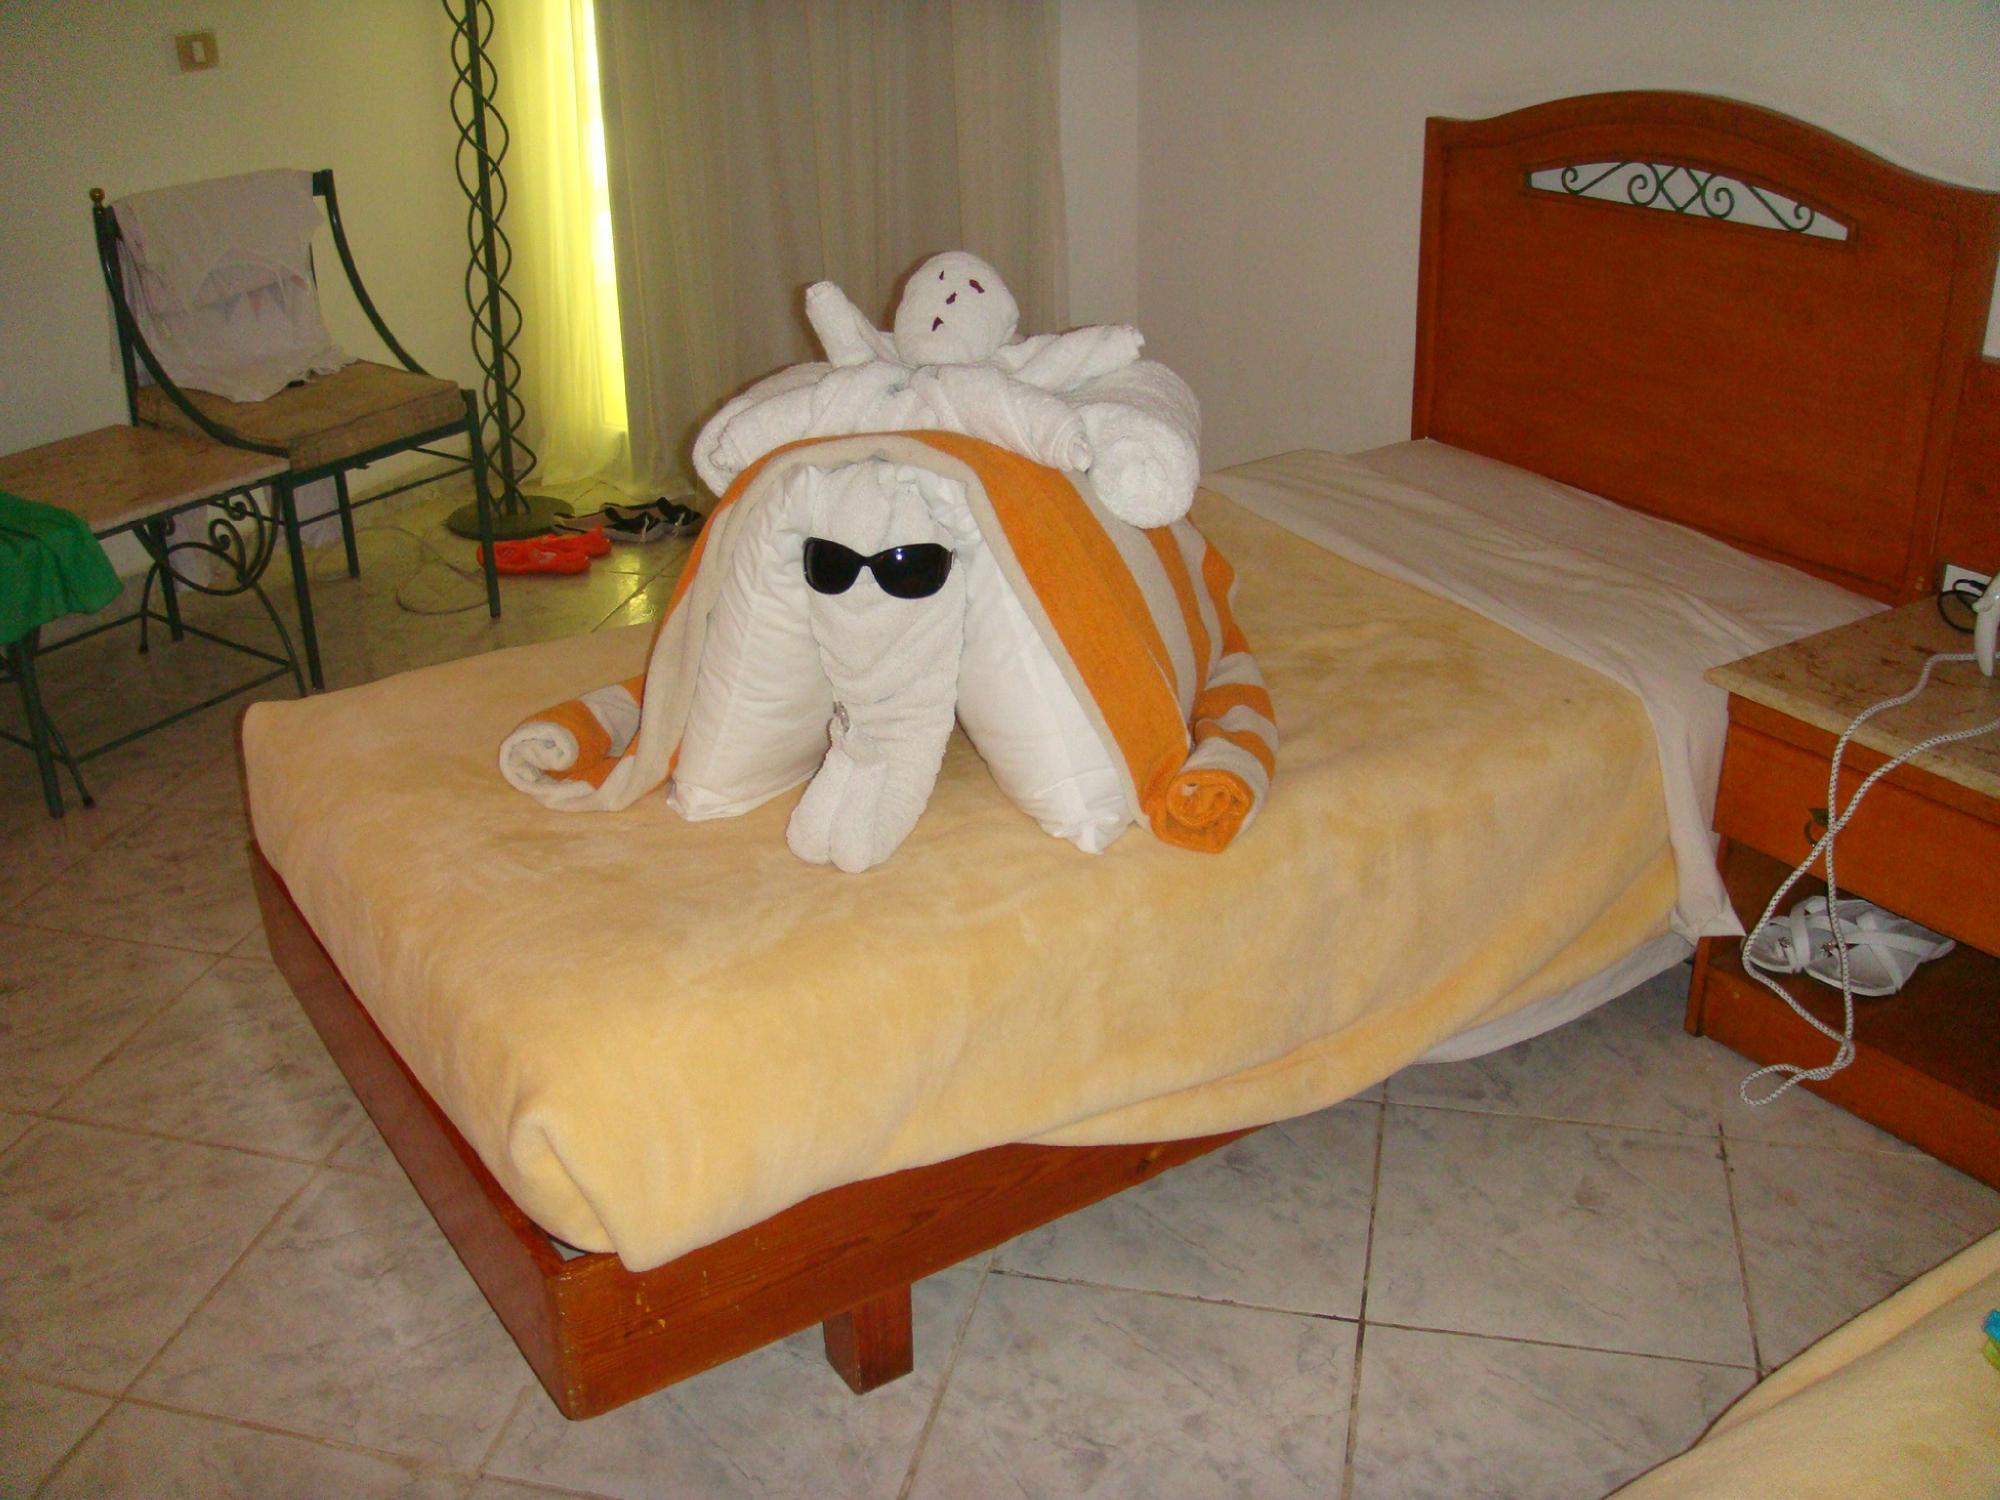 roma-host-way-hotel-aqua-park-genel-007